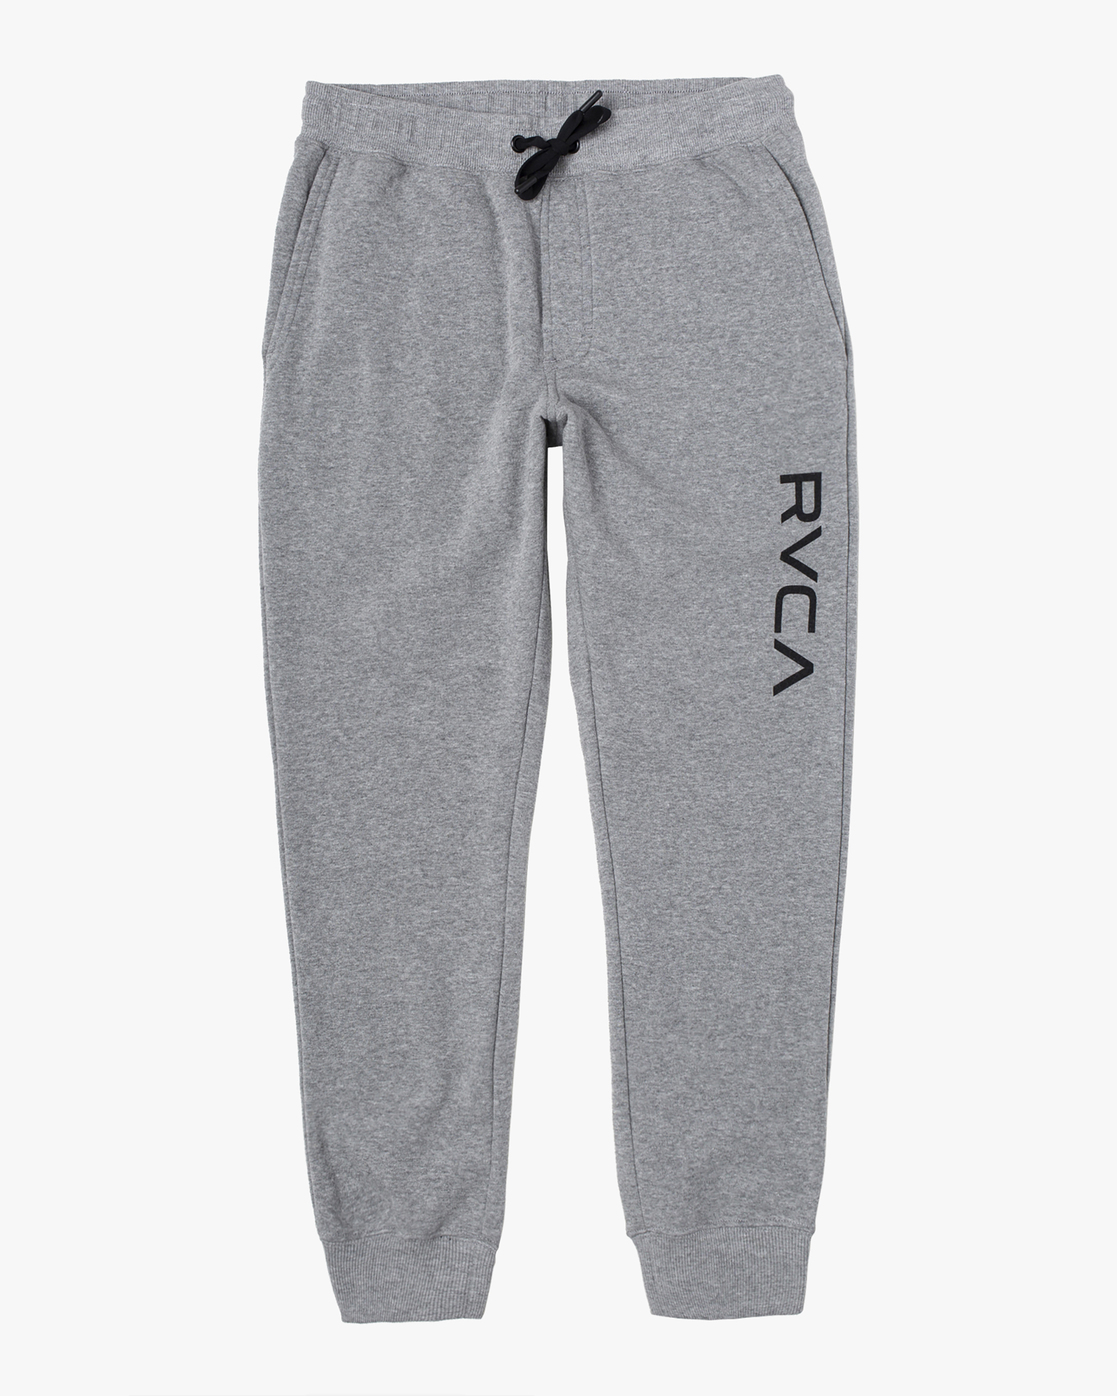 0 Boys Ripper Sweatpant Grey B301URRI RVCA